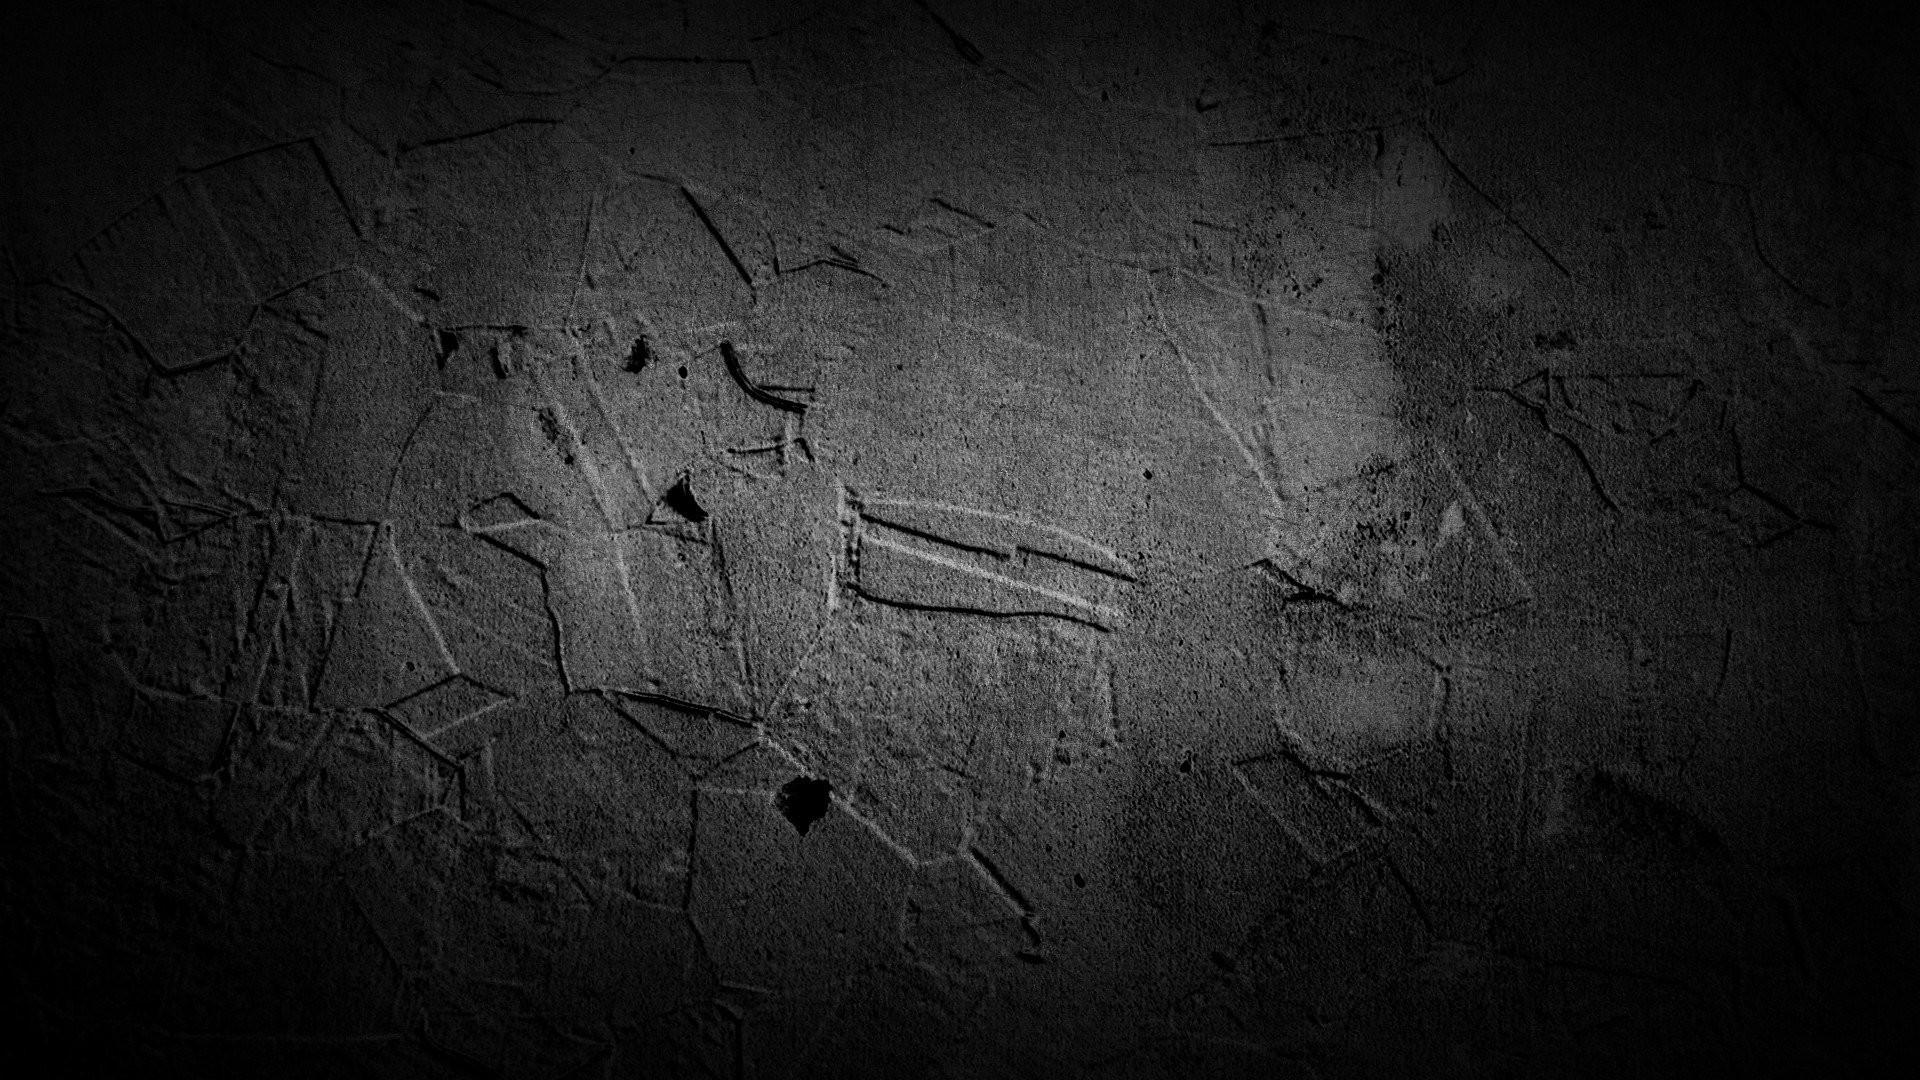 dallas cowboys hd wallpaper 1920x1080